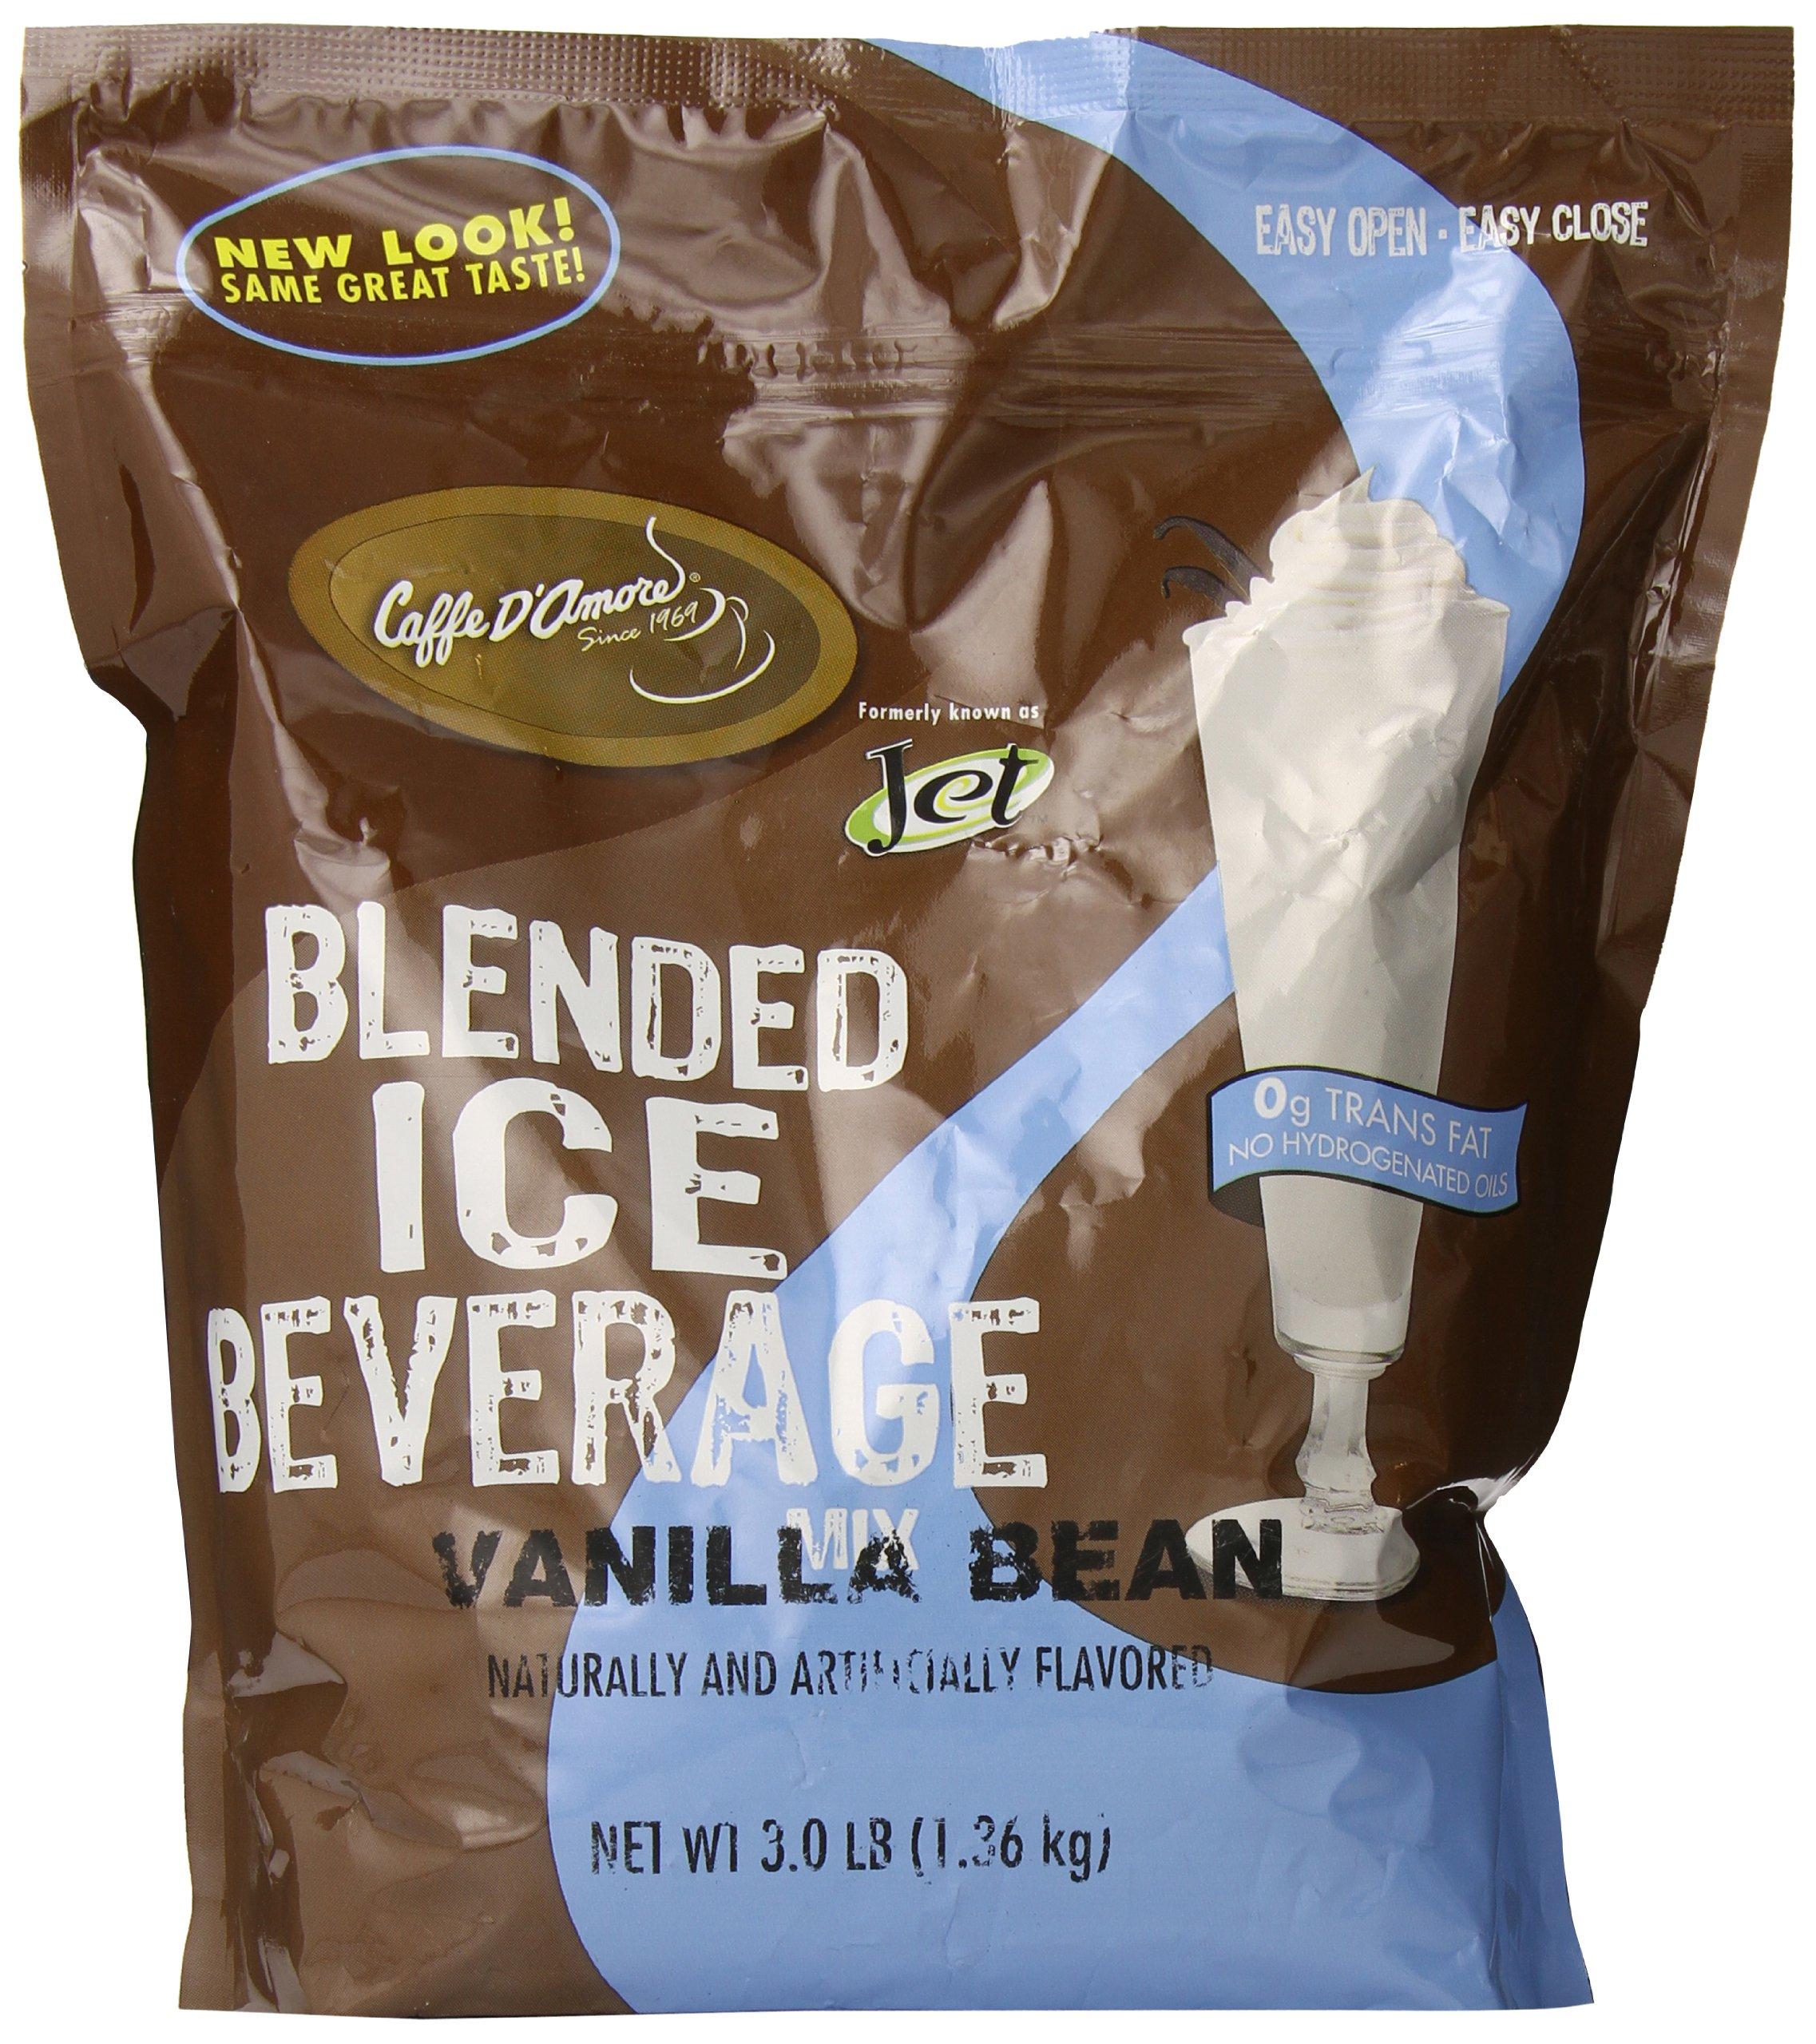 DaVinci Blended Ice Beverage, Vanilla Bean, 3 Pound Bag by Jet